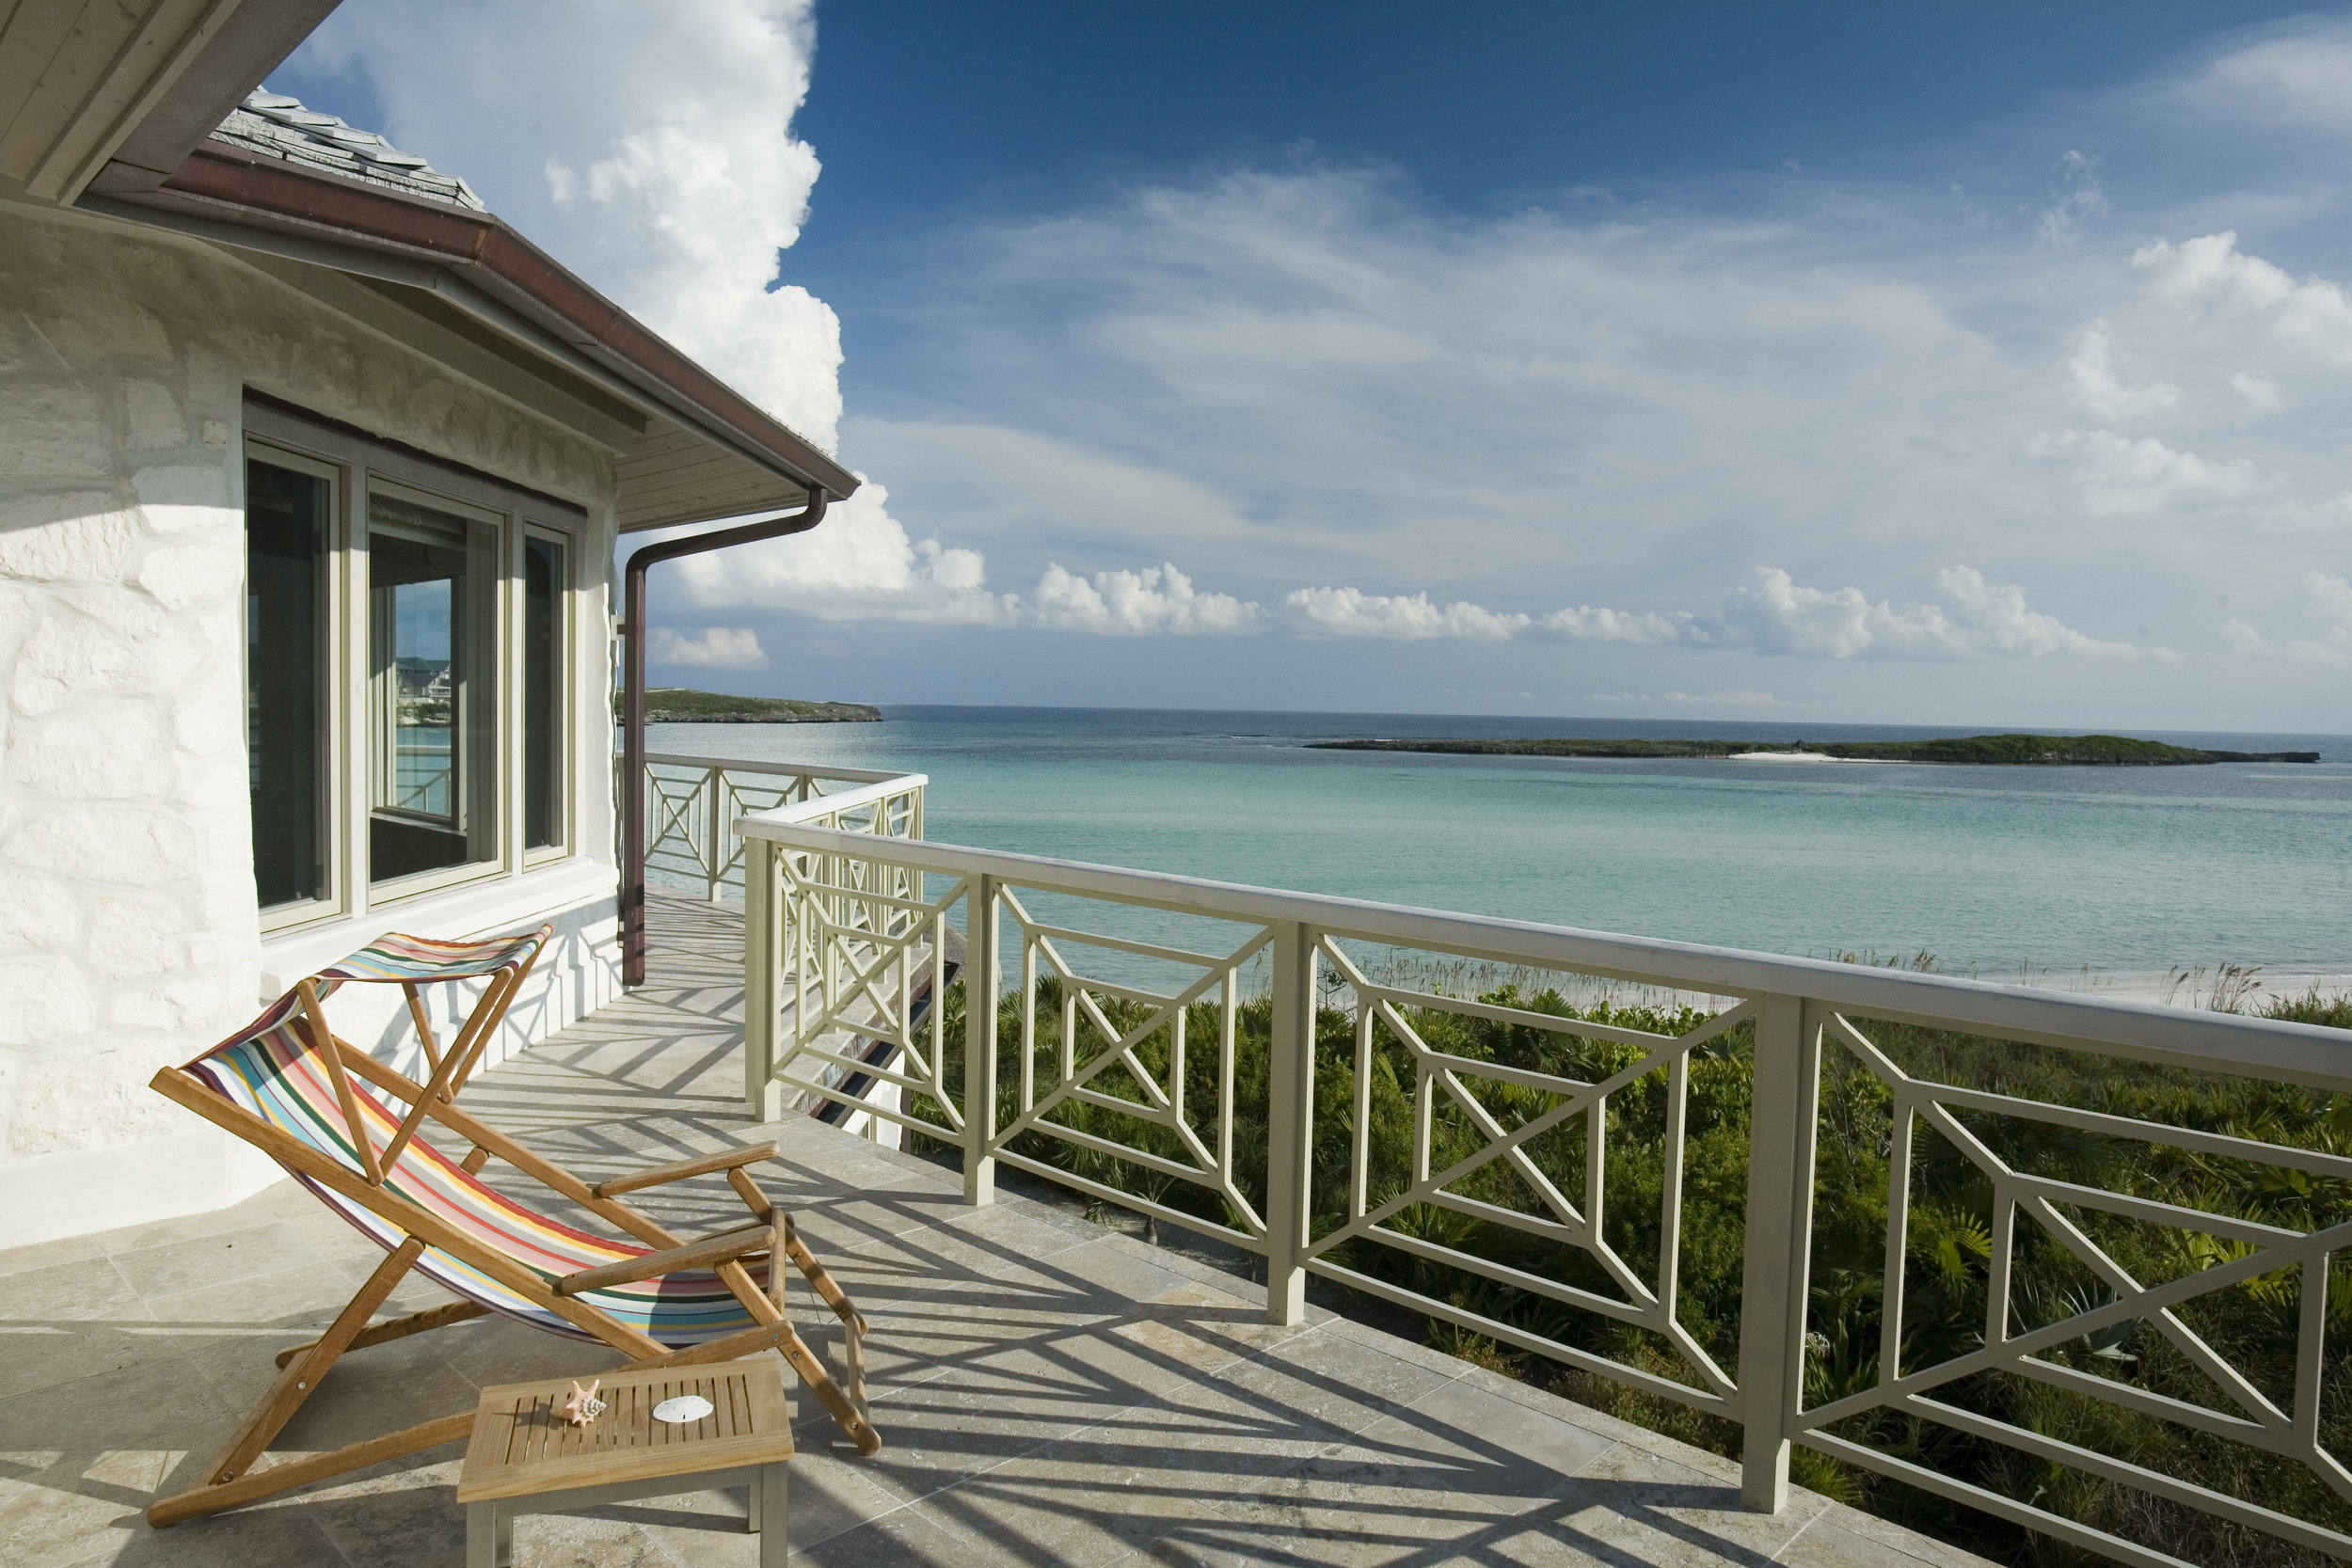 Beachfront Estate Bahamas Terrace by HDS Architecture